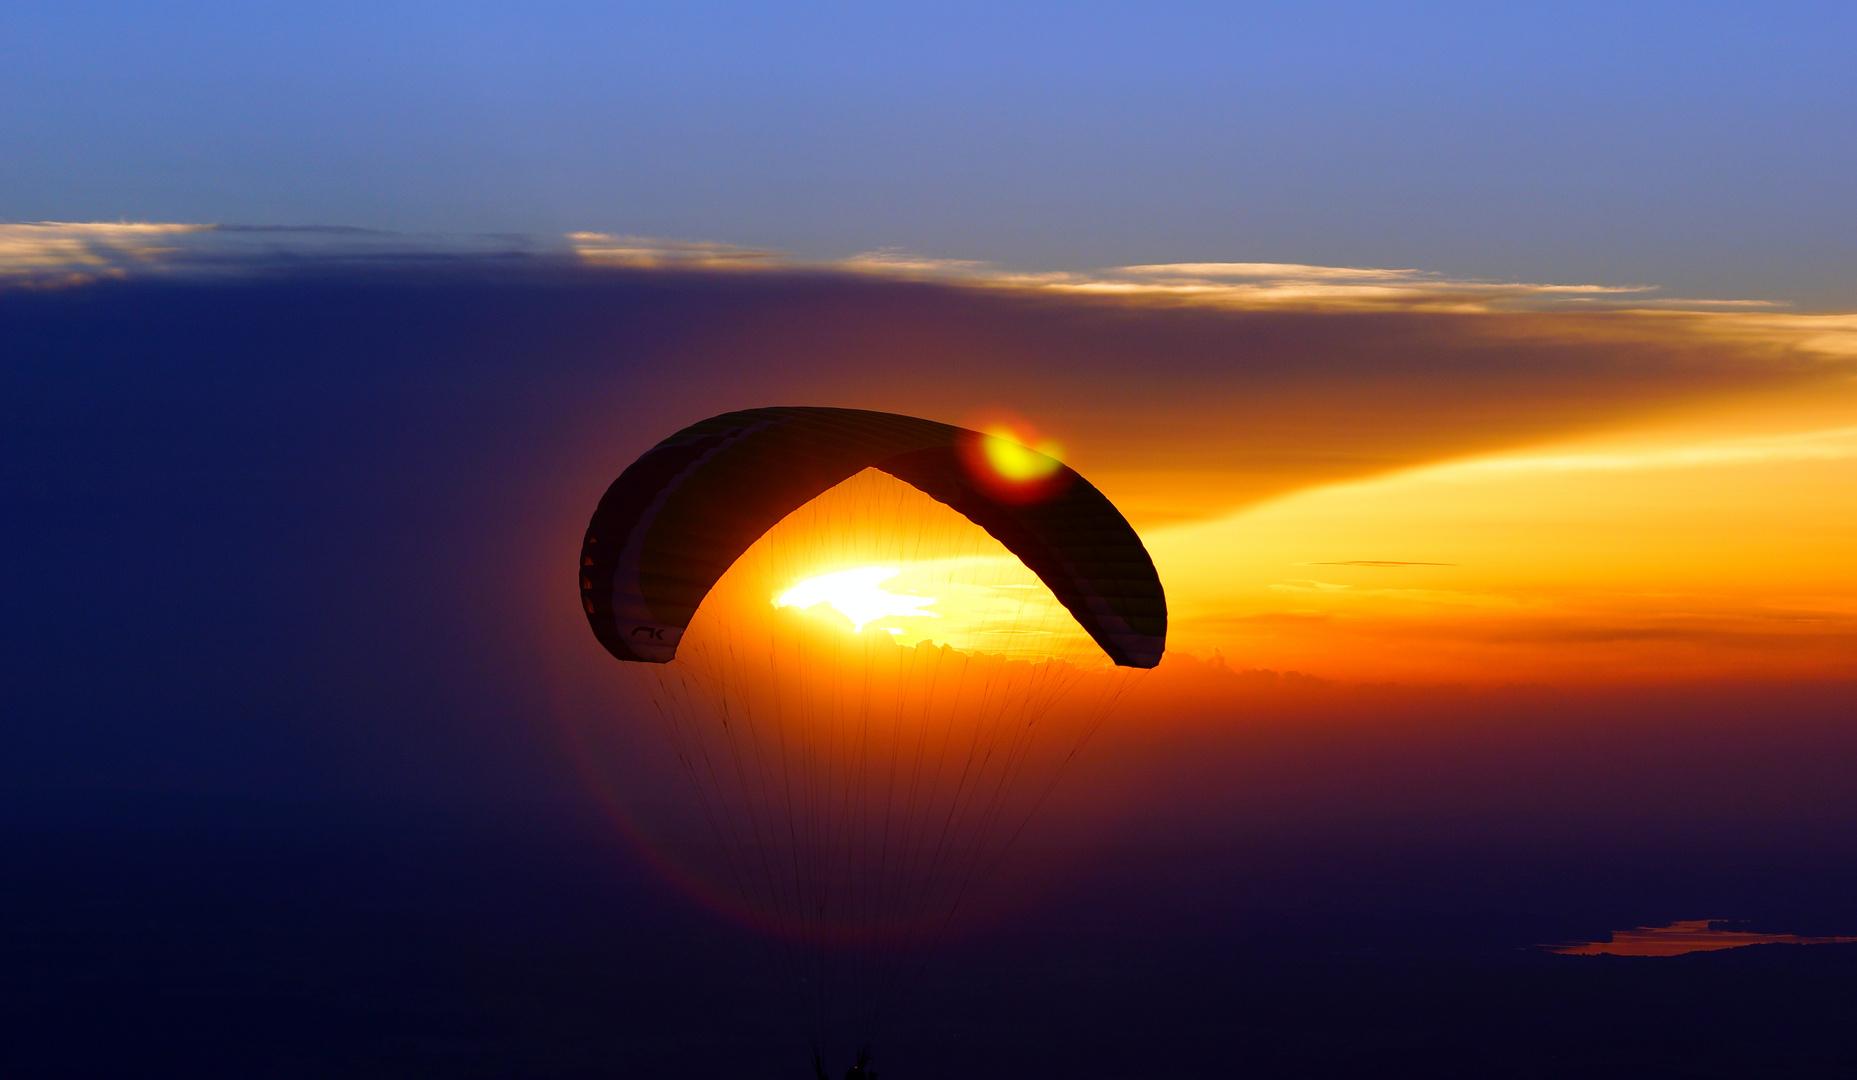 Flug in den Abendhimmel